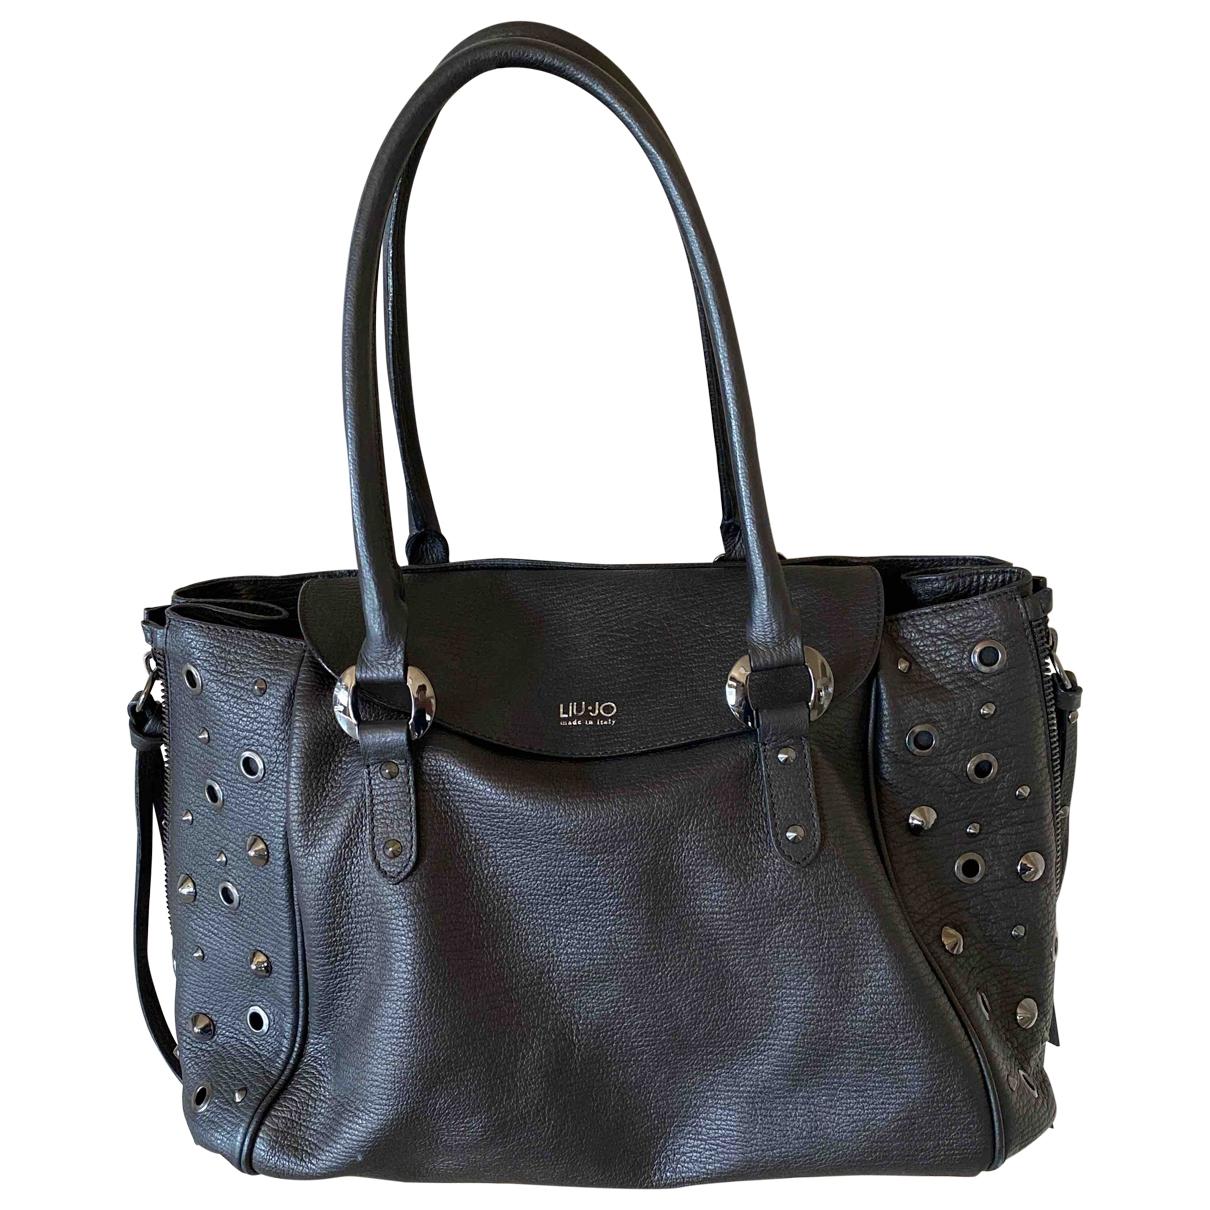 Liu.jo \N Handtasche in  Schwarz Leder